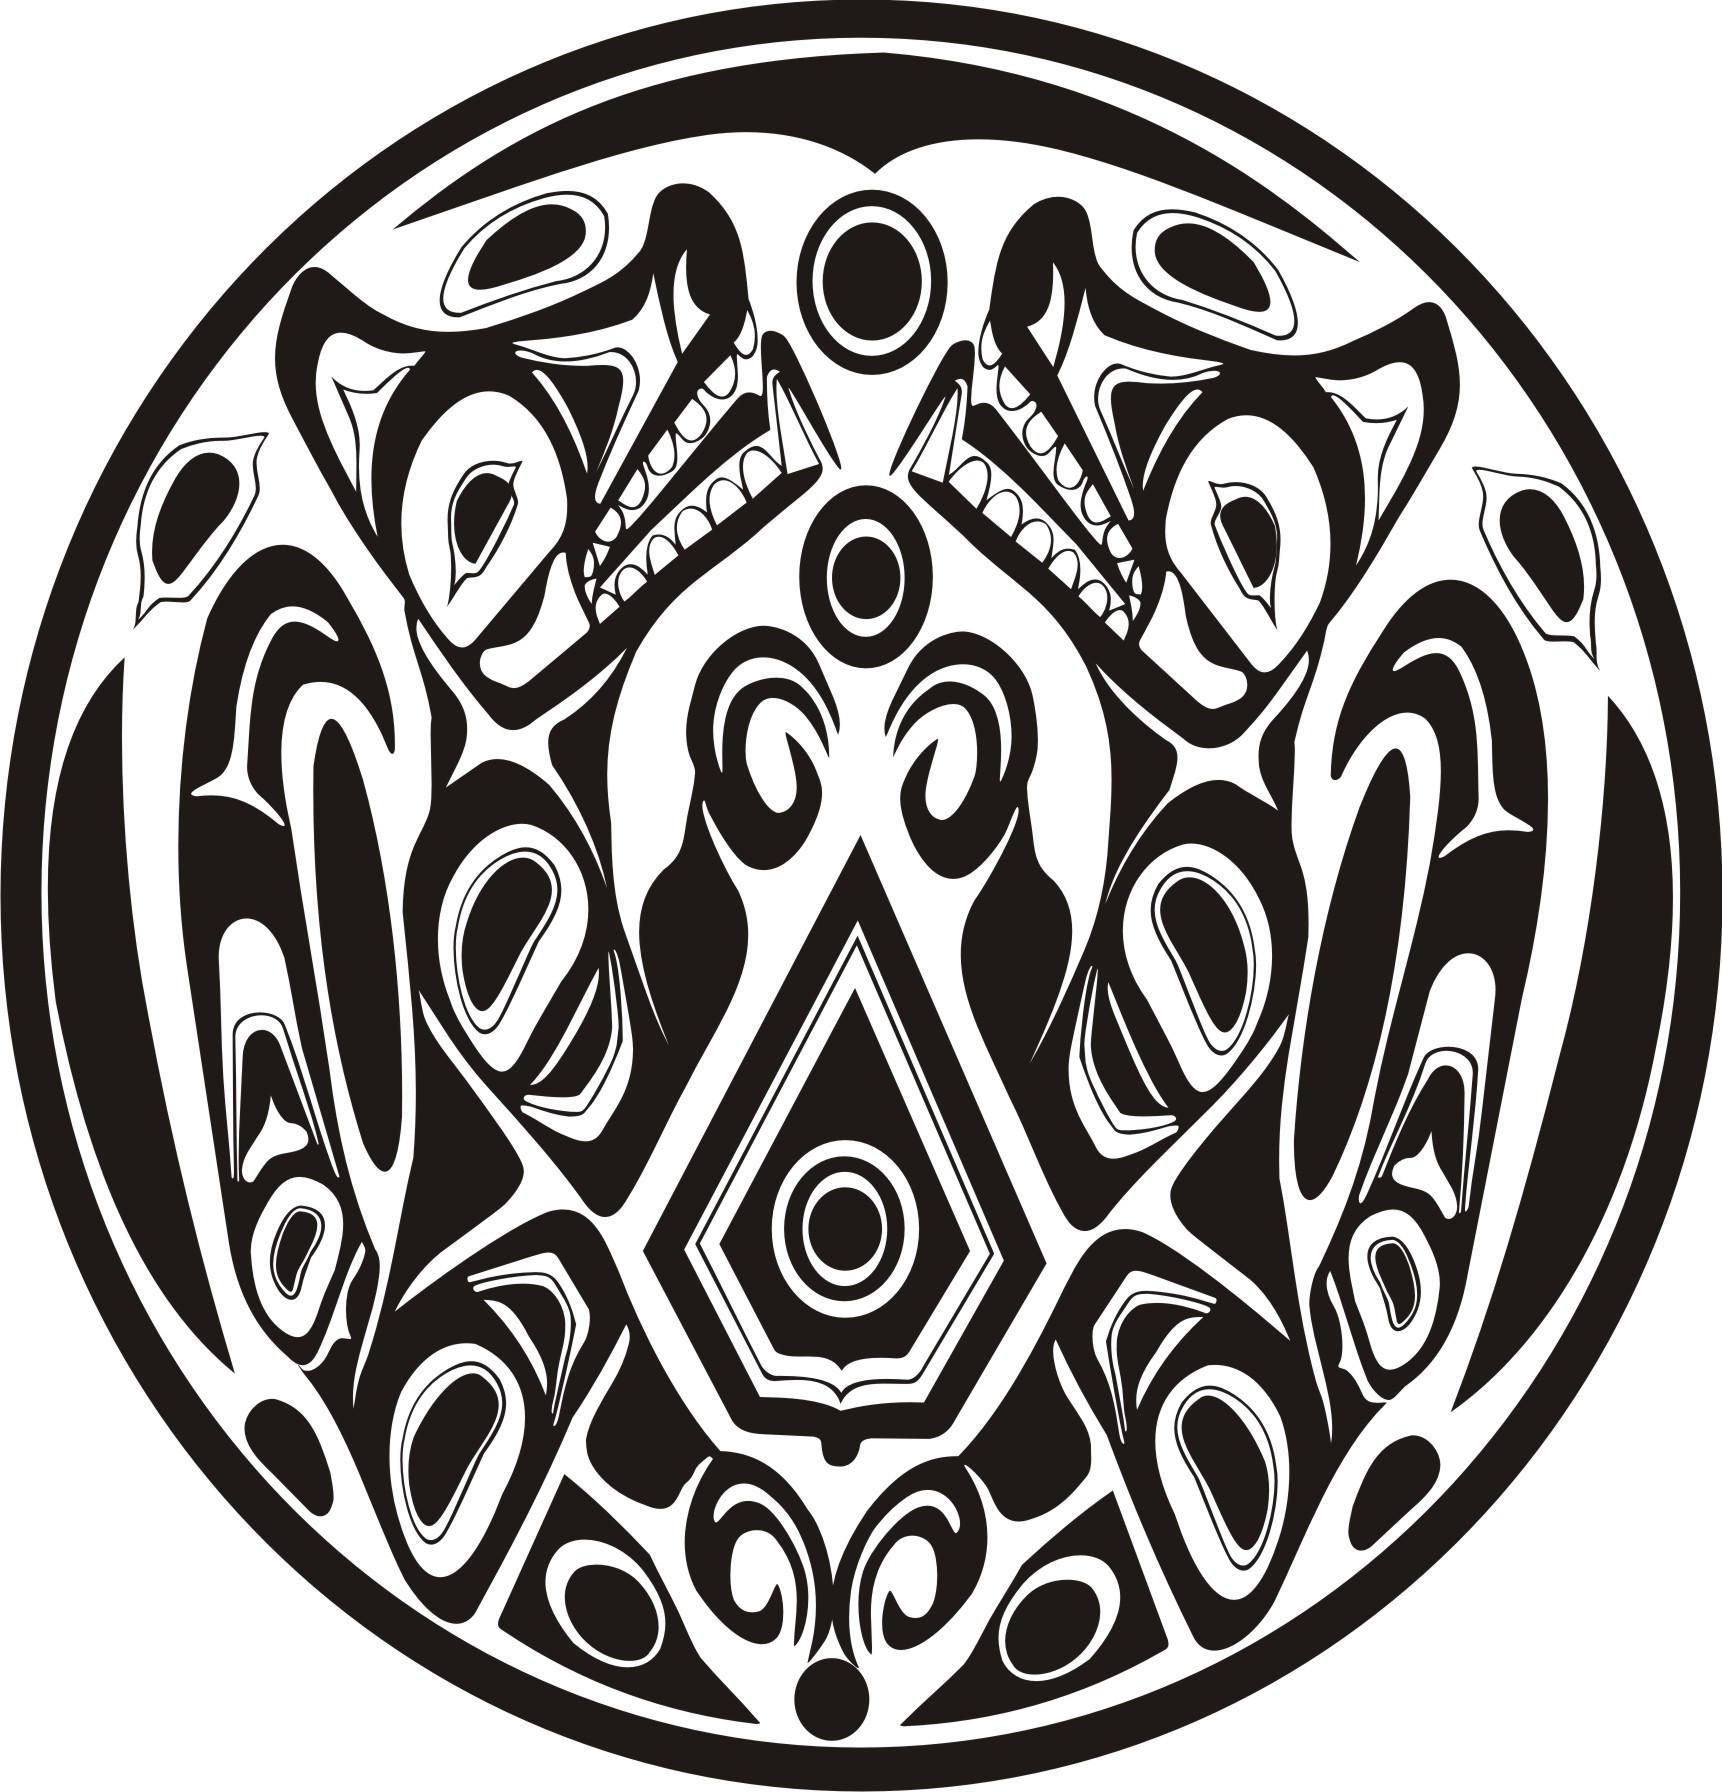 Jacob Black Tattoo by TwilightSagaAro on DeviantArt